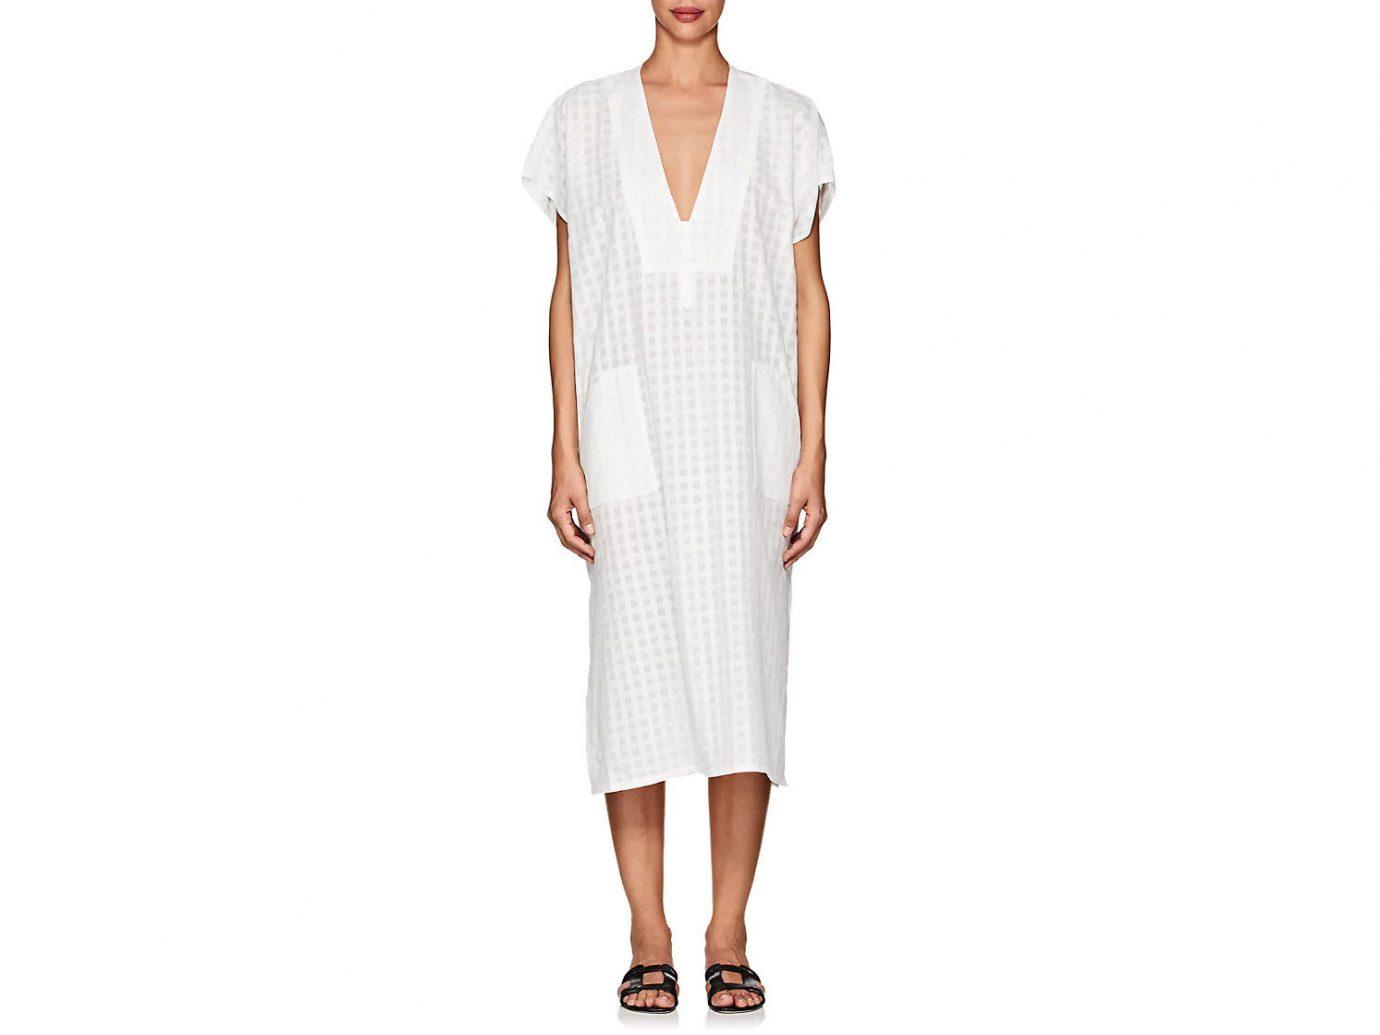 Style + Design Travel Shop clothing day dress dress fashion model outerwear neck sleeve costume fashion design trouser